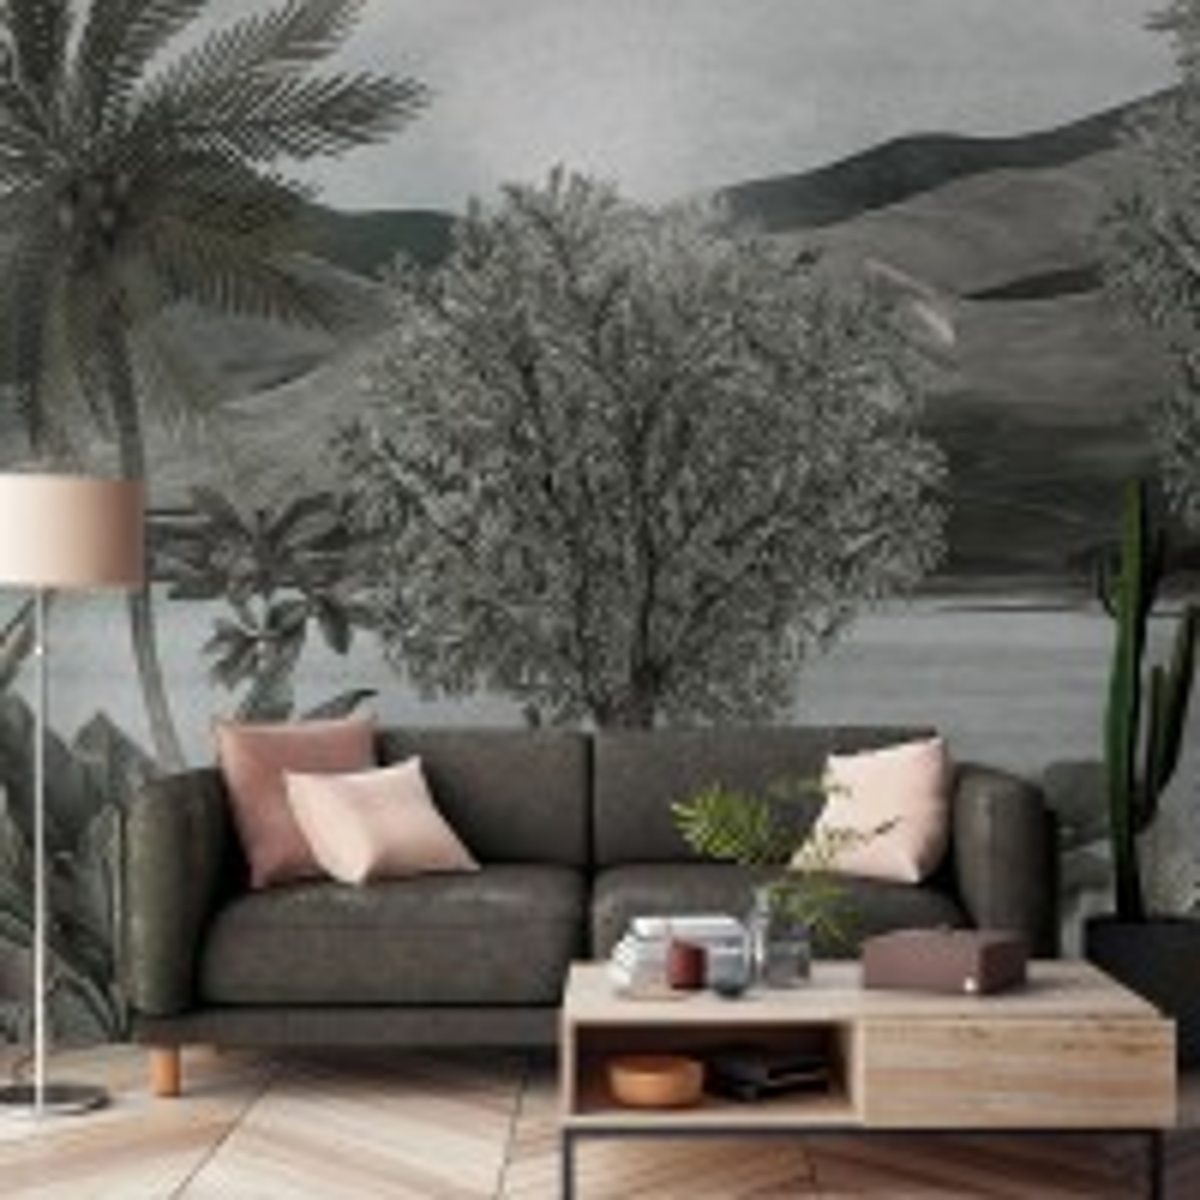 Dreamy Tropical Dark Forest Scene Wallpaper Mural